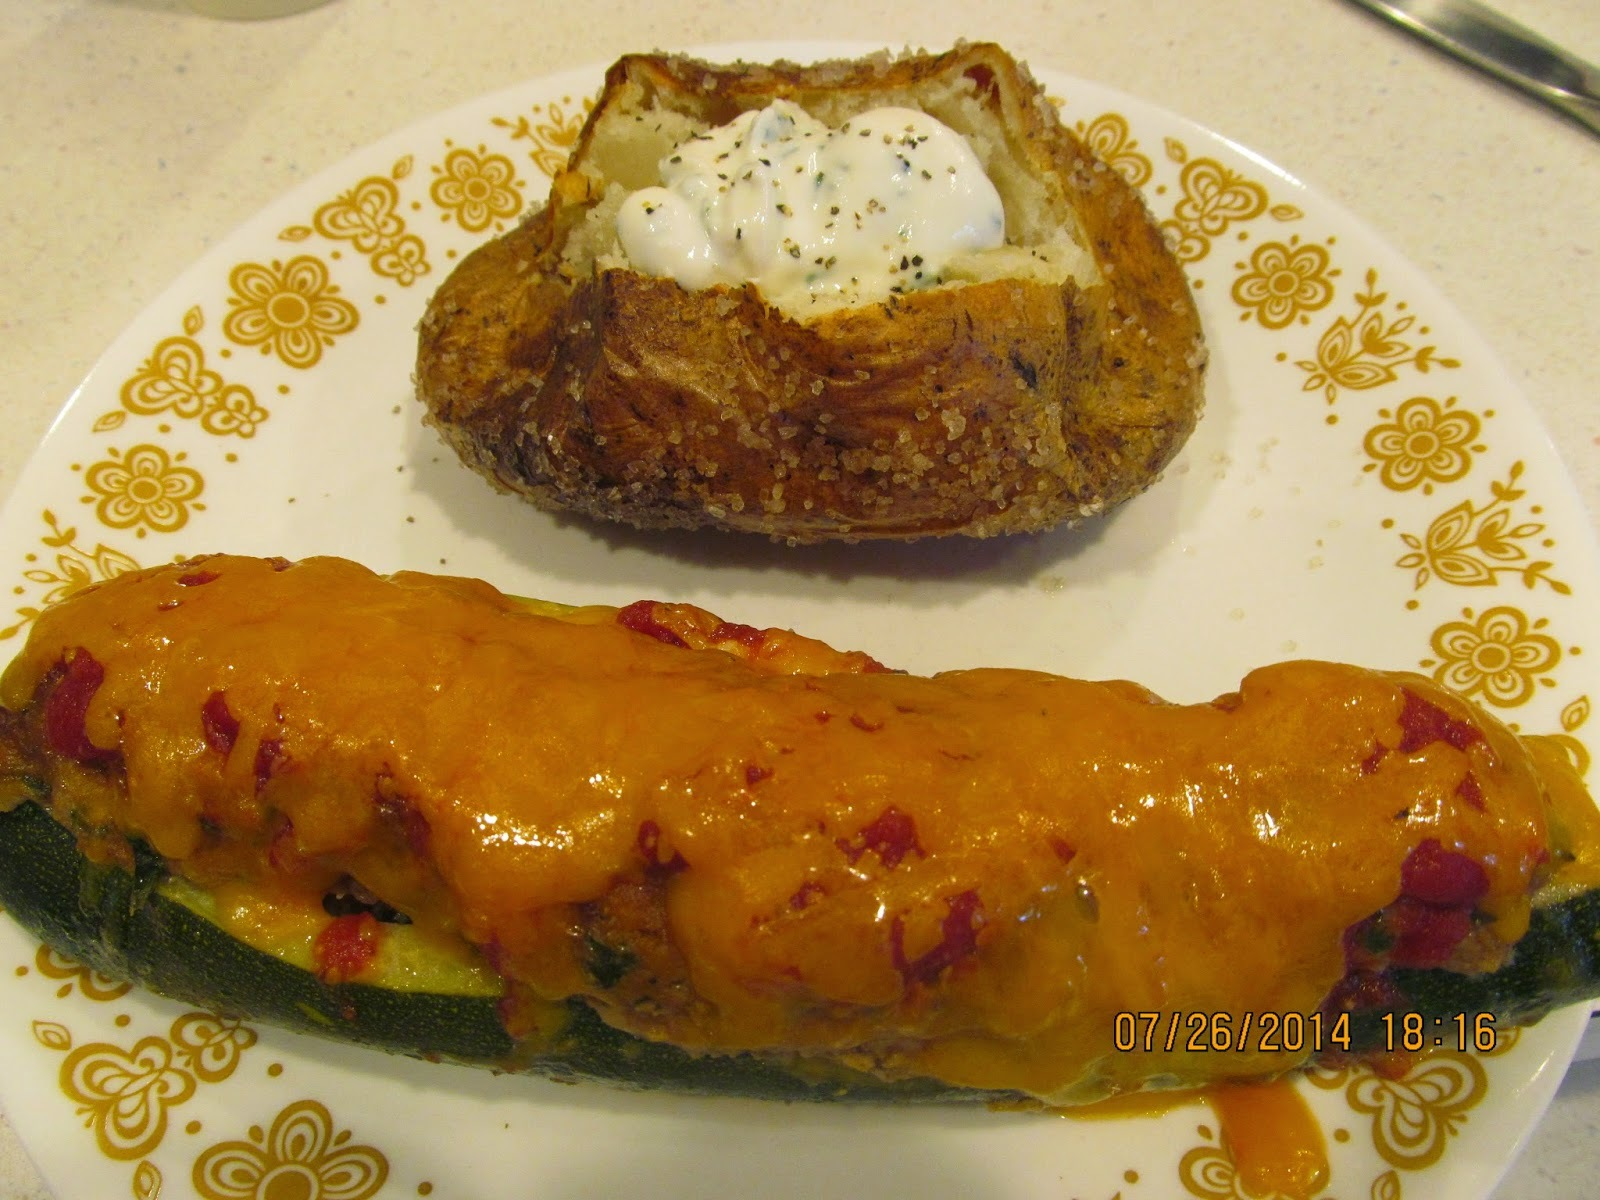 Recipe: Stuffed Zucchini & Restaurant Baked Potatoes*